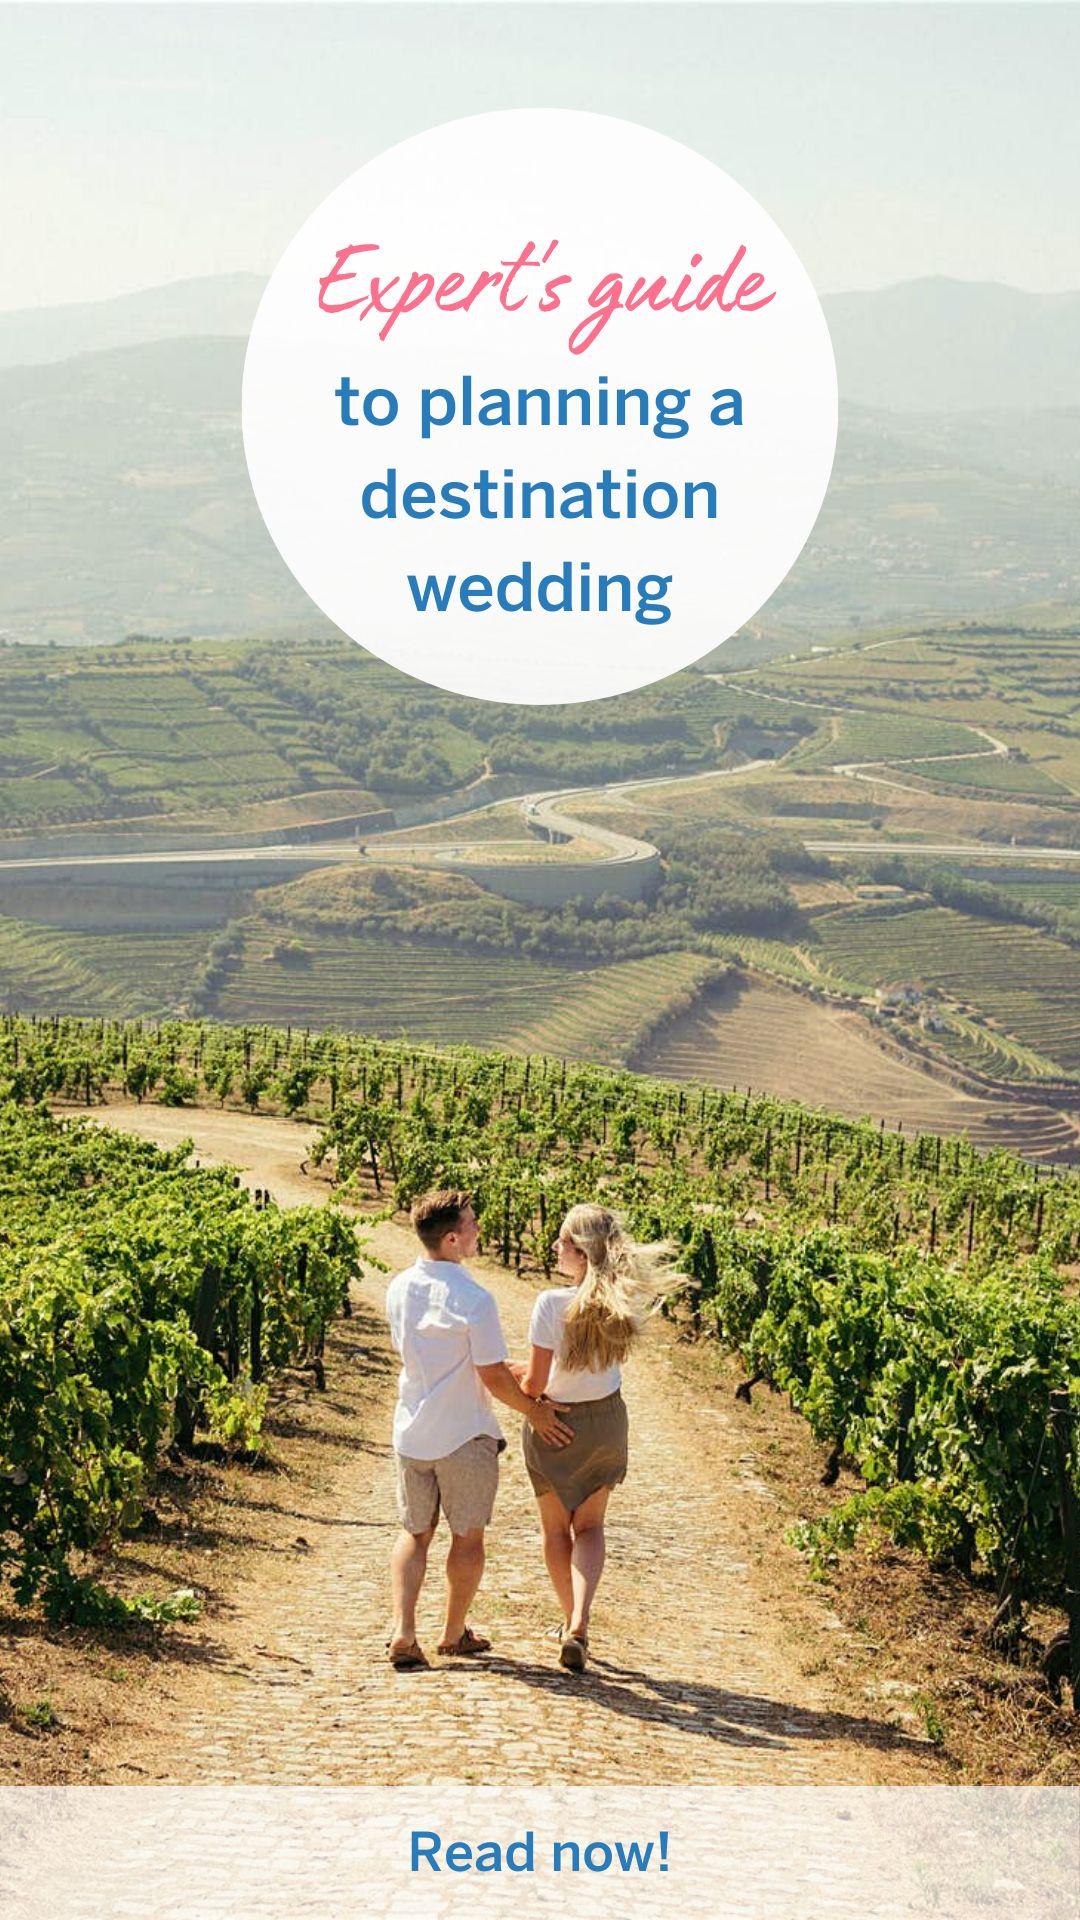 An expert's guide to planning a destination wedding